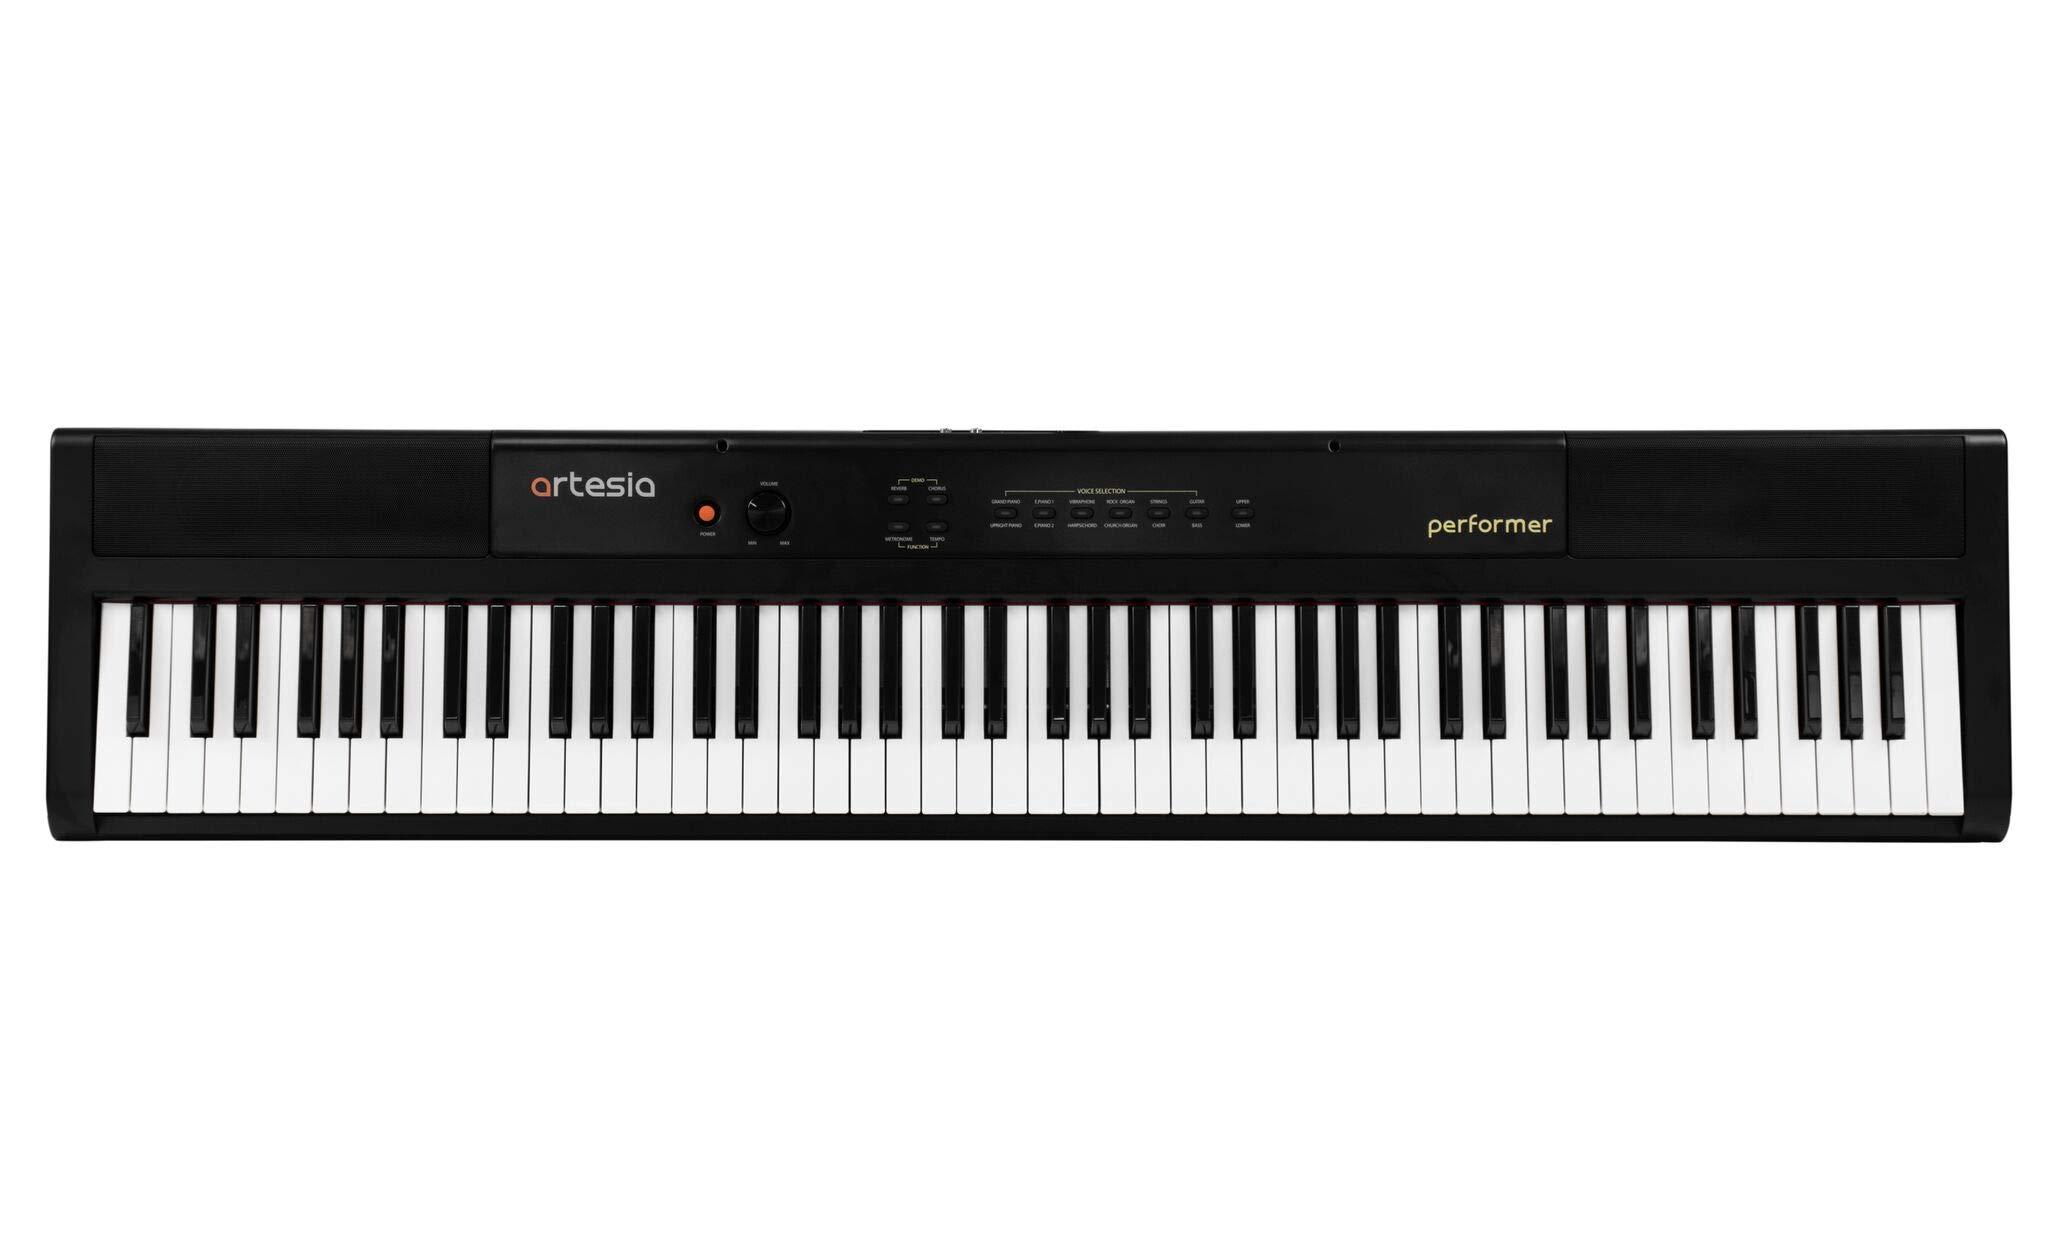 Artesia 88-Key Portable Keyboard Single Performer by Artesia